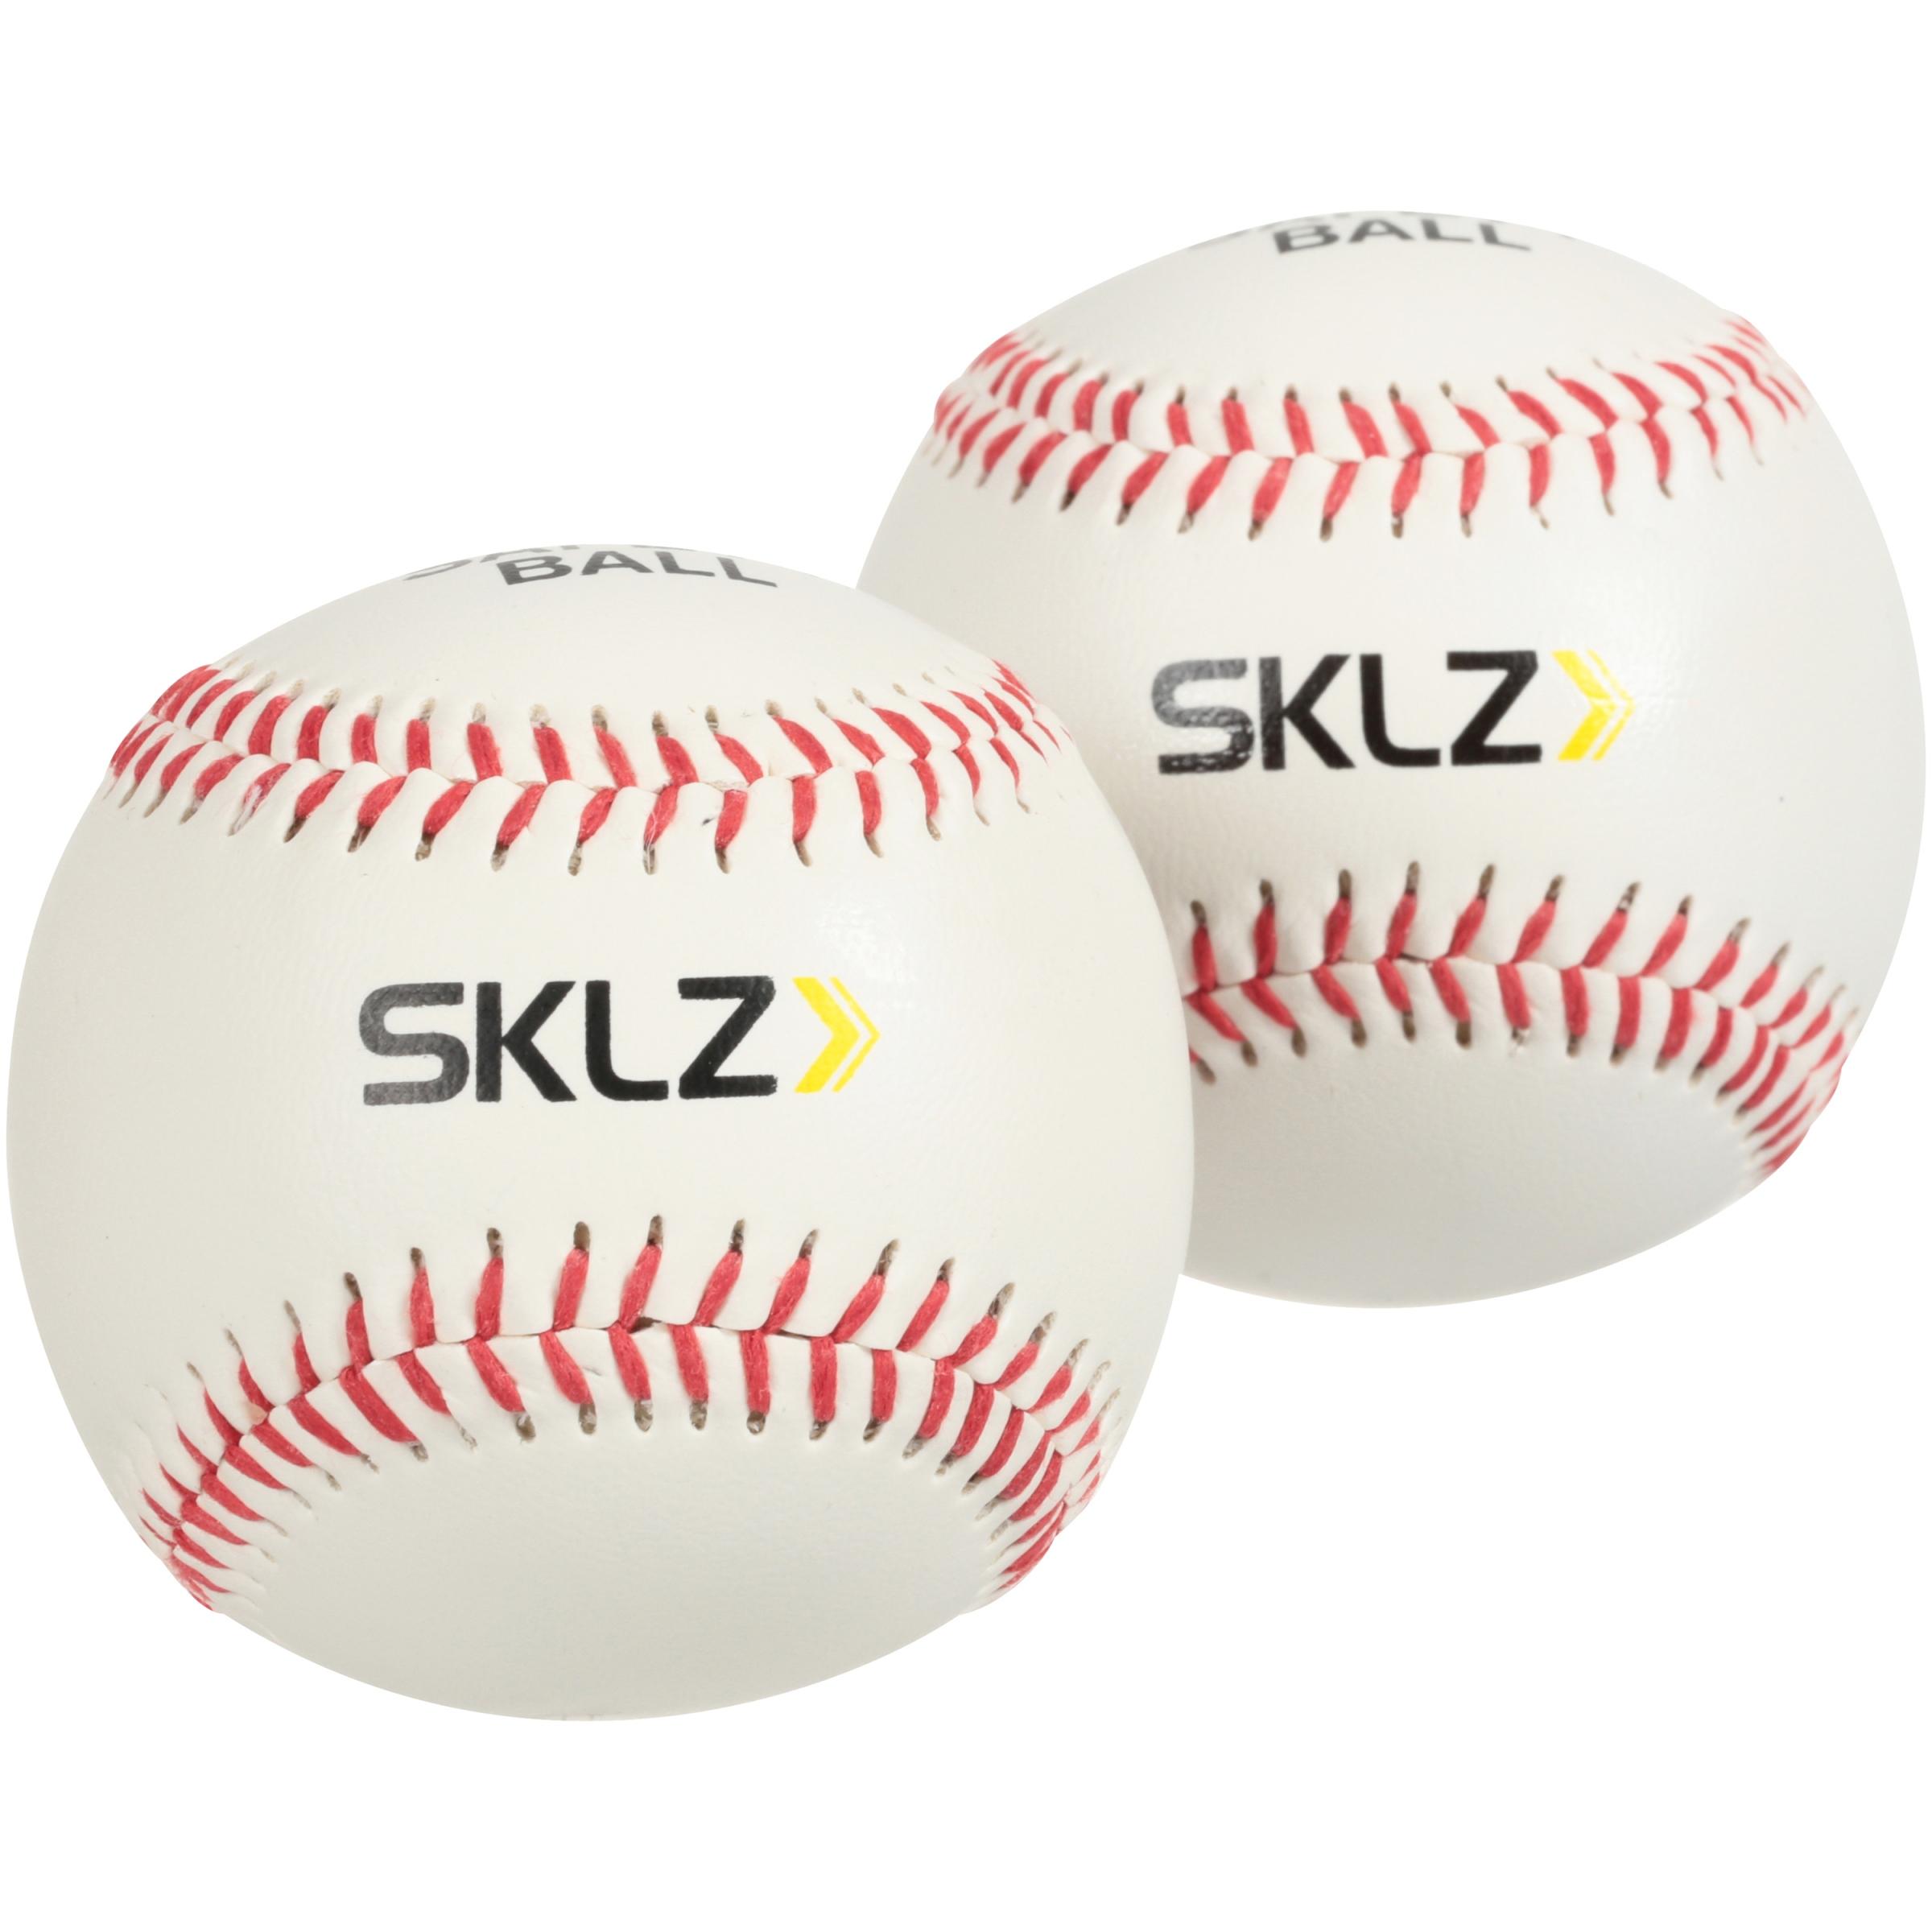 SKLZ Safety Balls Reduced-Impact Training Baseballs 2 ct Pack